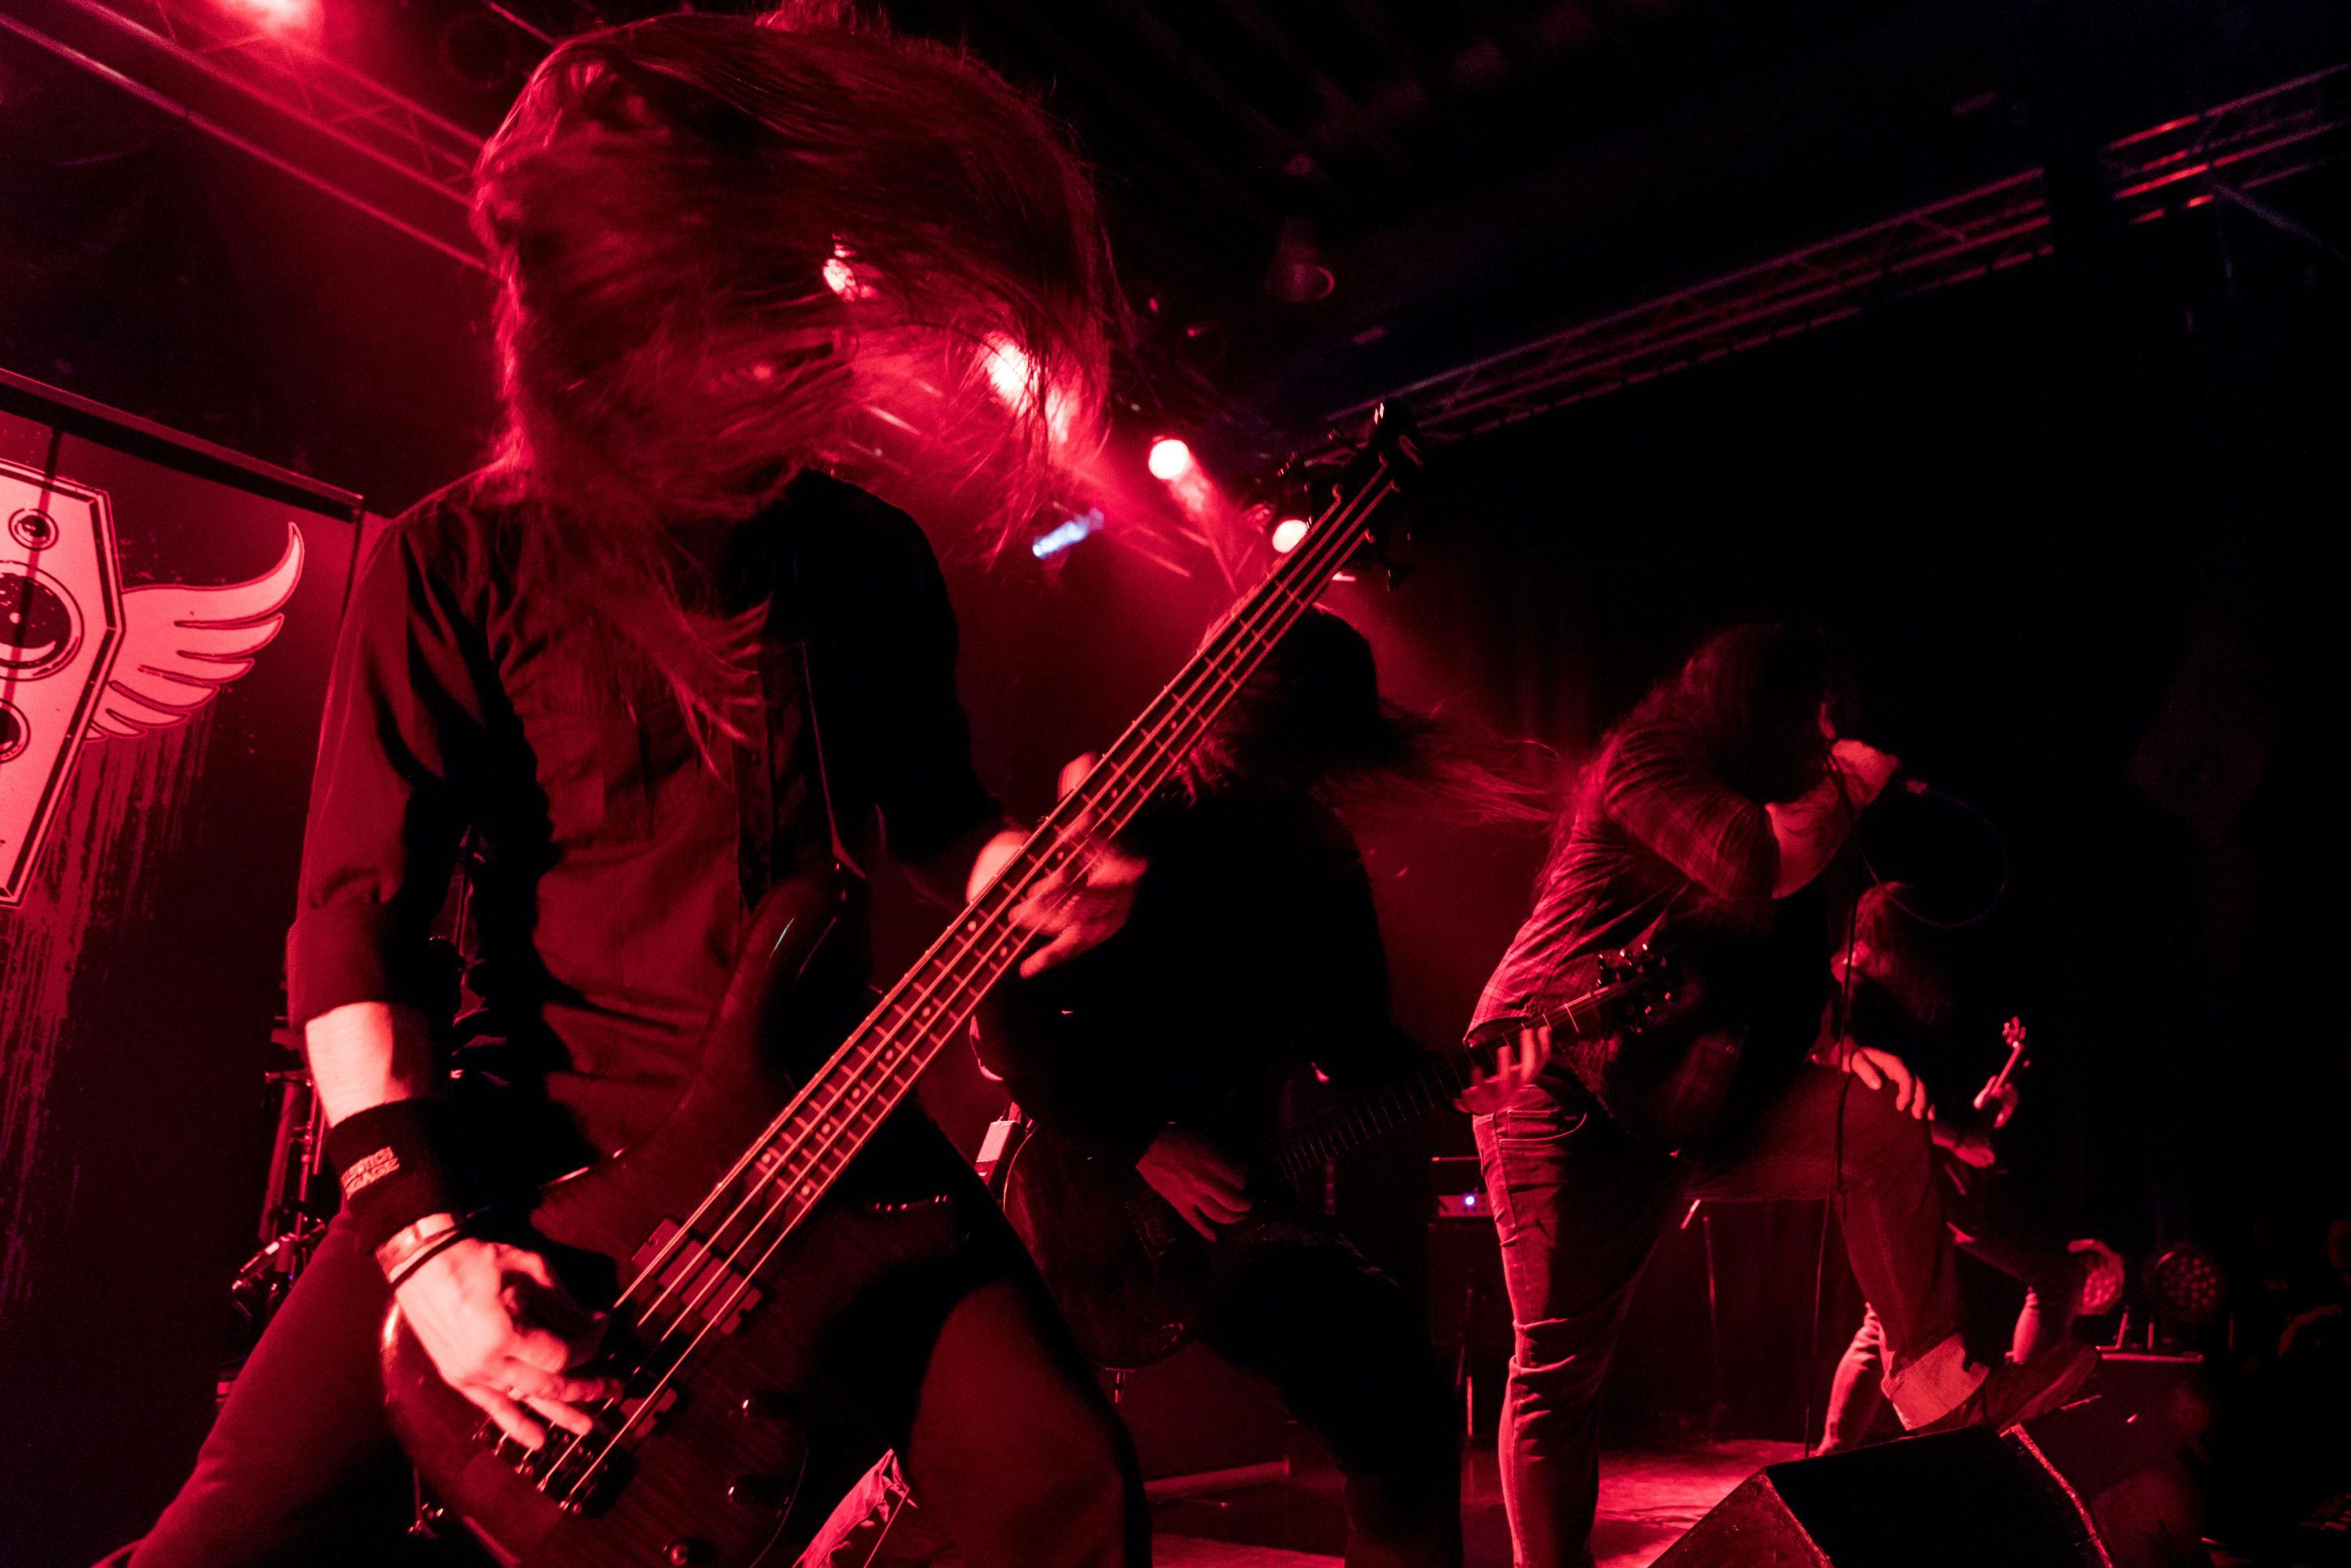 the-very-end-live-zeche-carl-essen-germany-thrash-metal_5